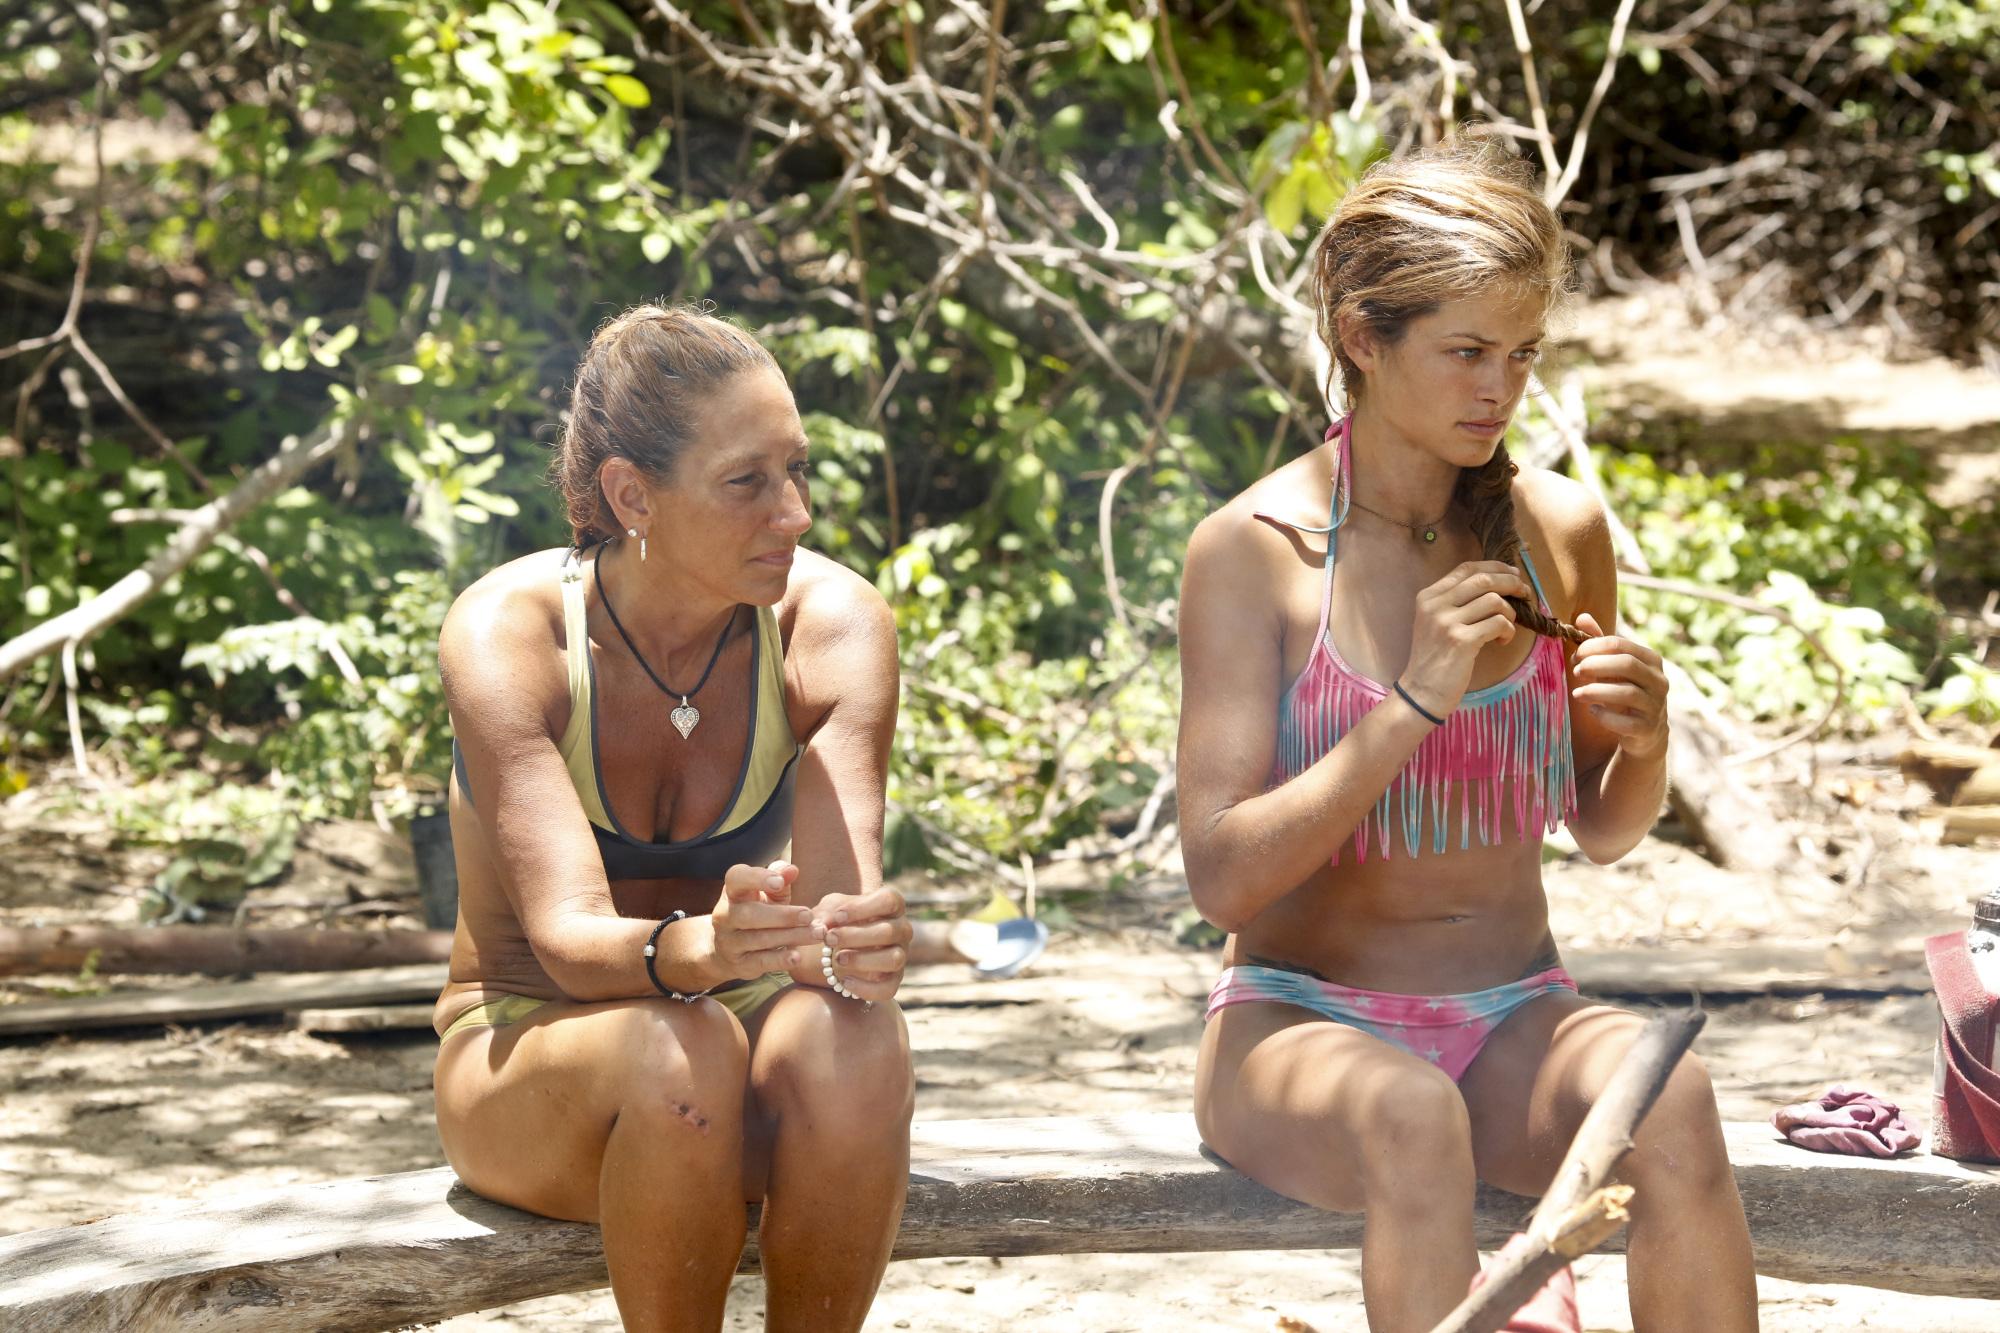 Carolyn and Hali sit together